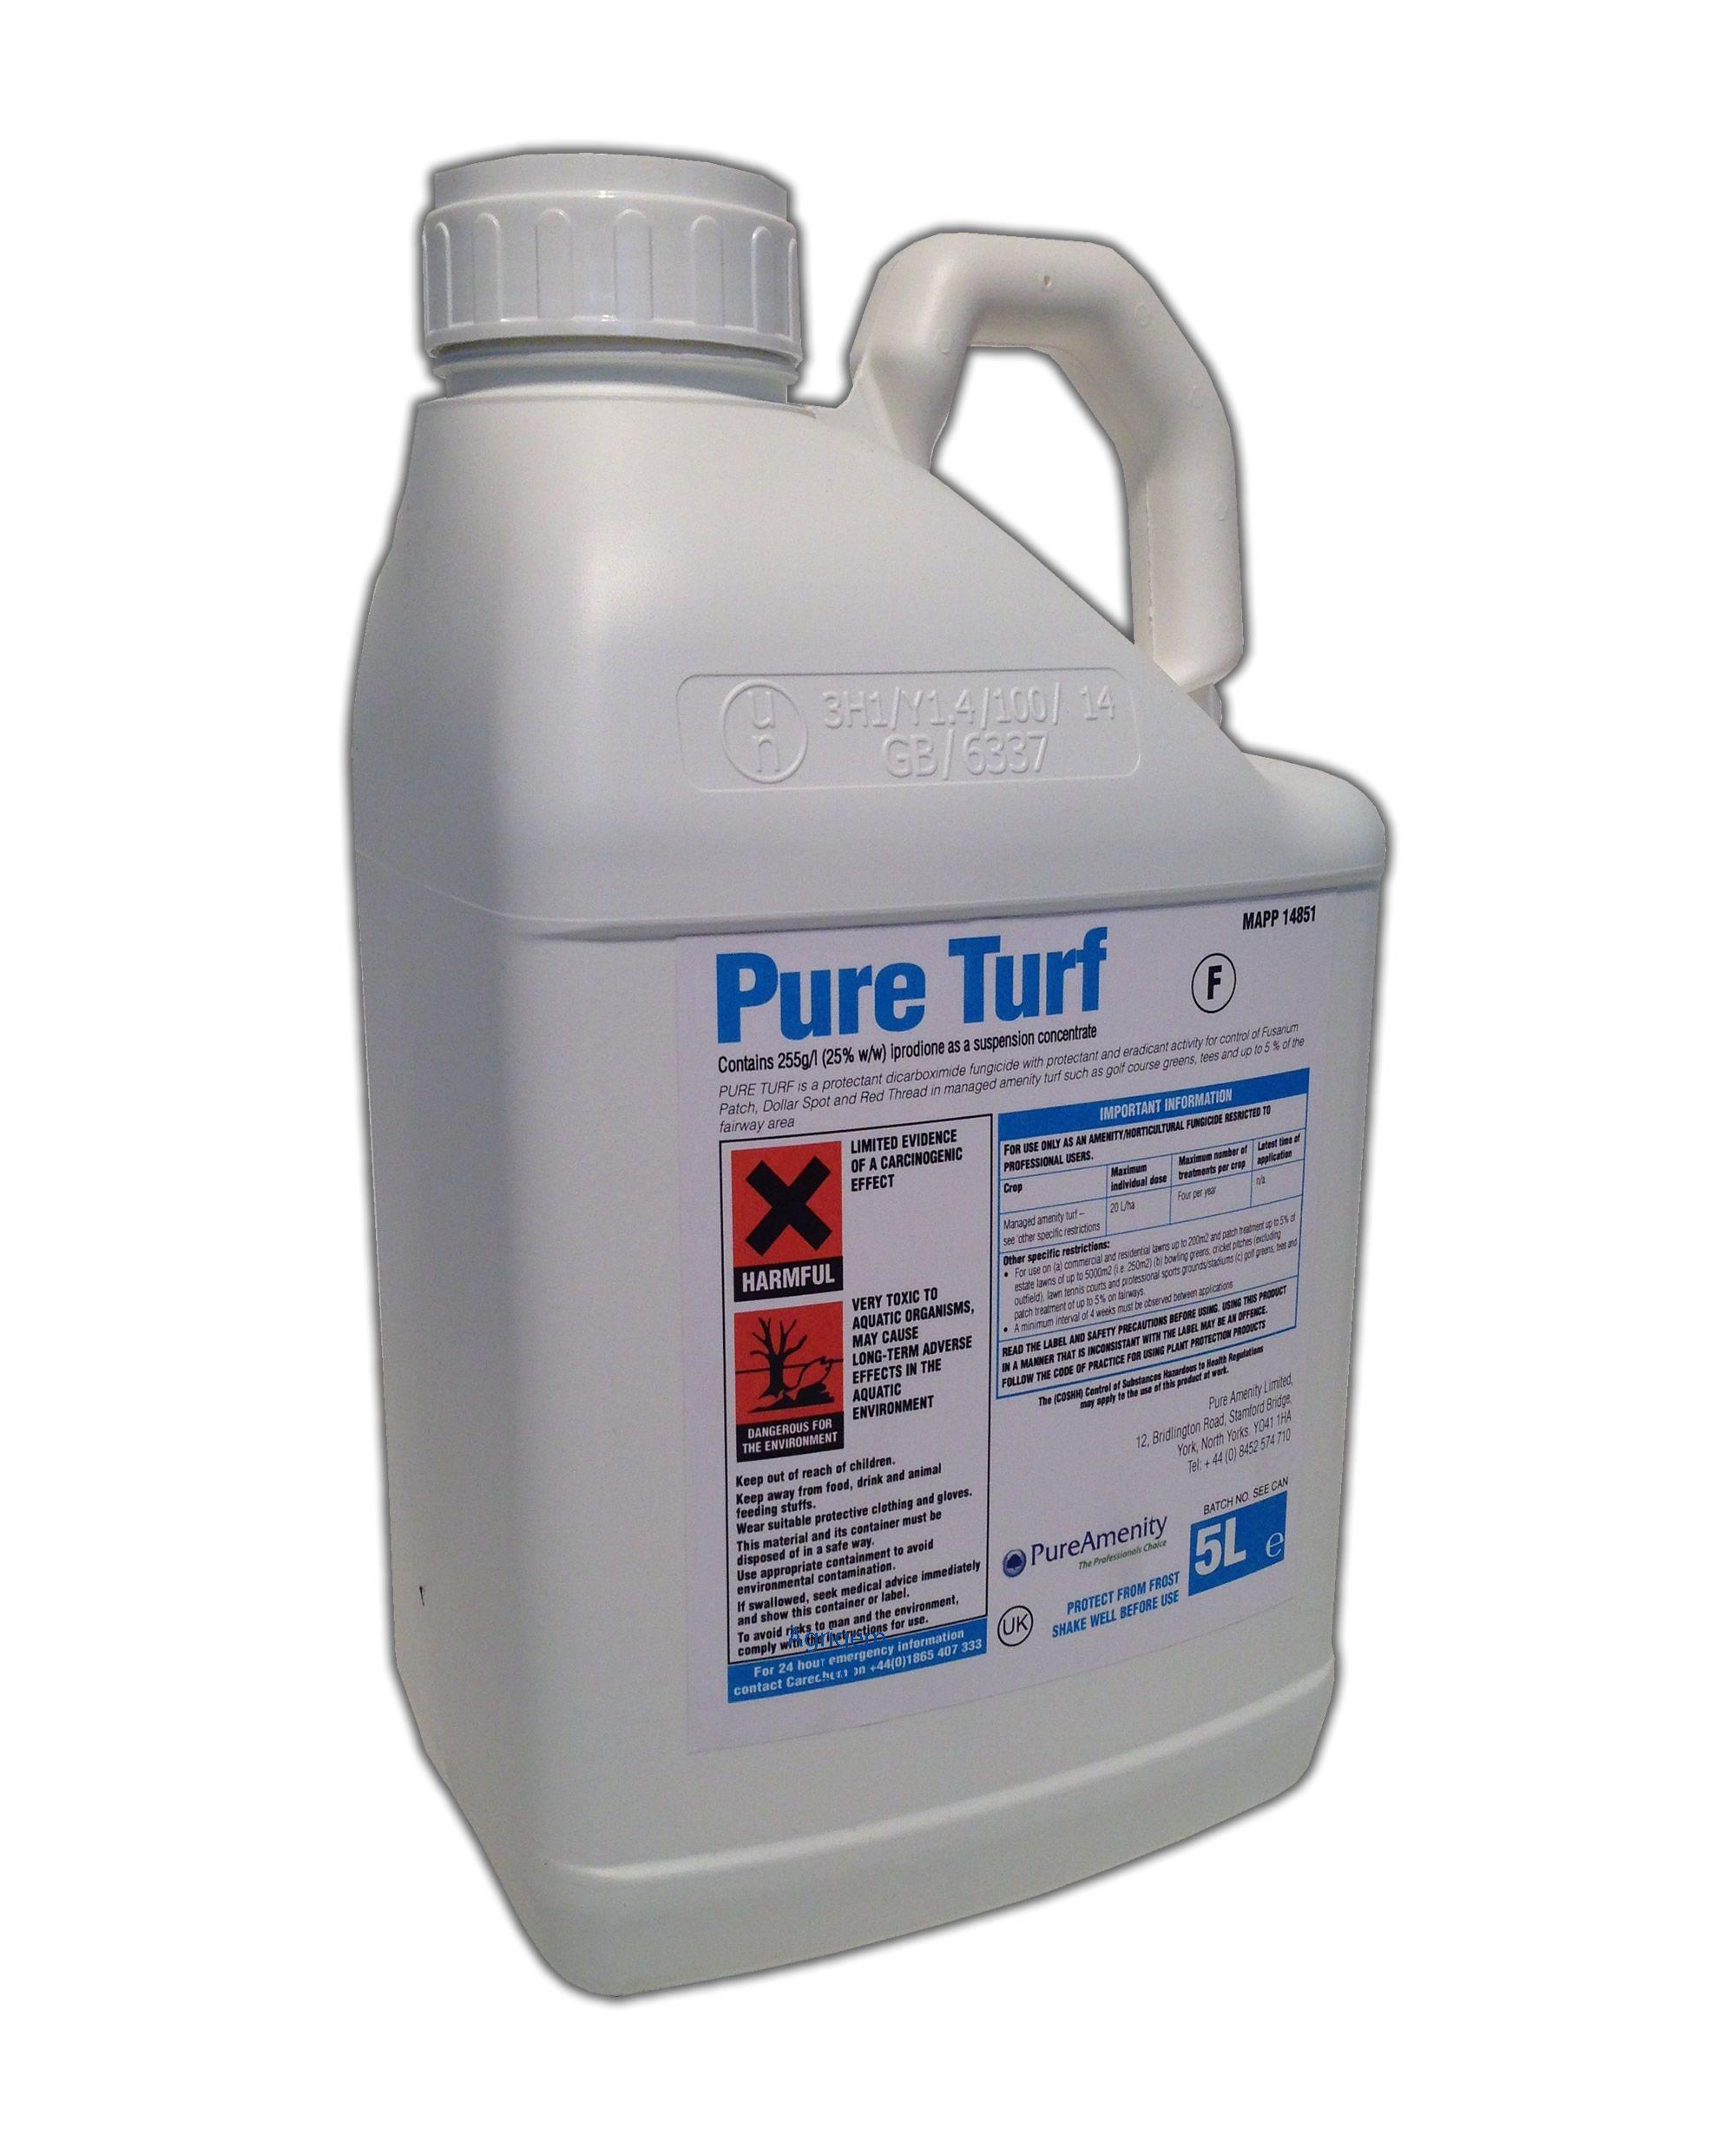 Pure Turf